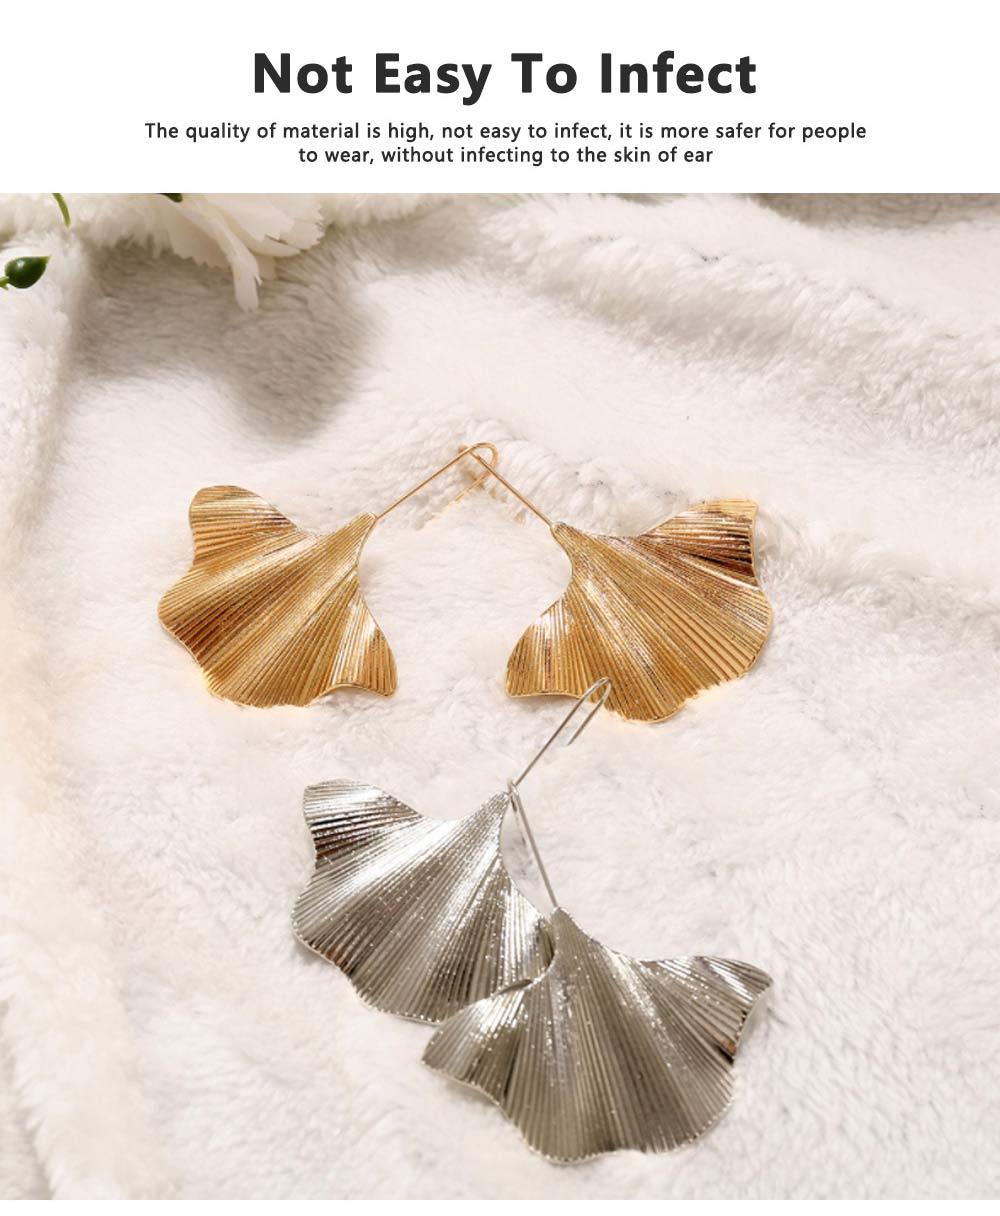 Minimalist Alloy Gold Ginkgo Biloba Leaf Simple Folded Female Hammered Creative Stud Earrings Multi Layer Acrylic Bohemian Fashion Jewellery 4